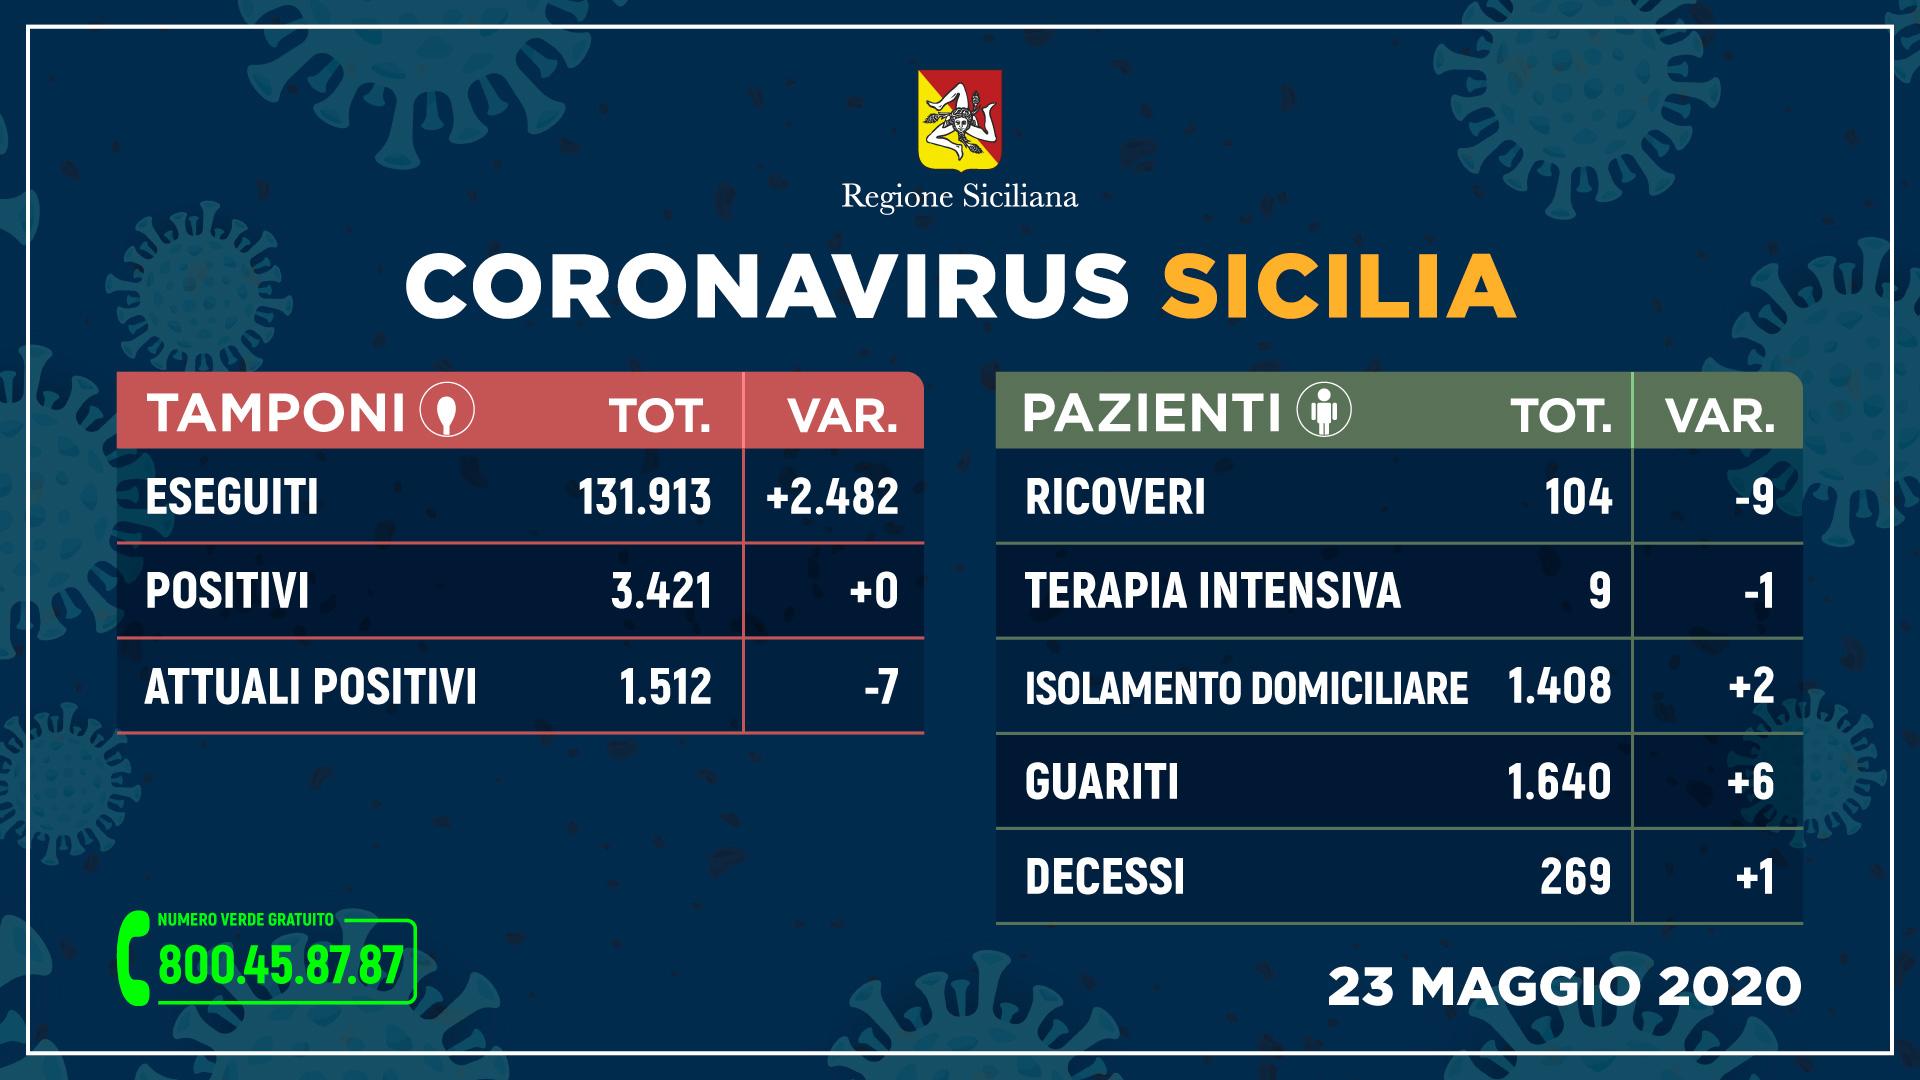 Coronavirus, in Sicilia prima volta senza contagi